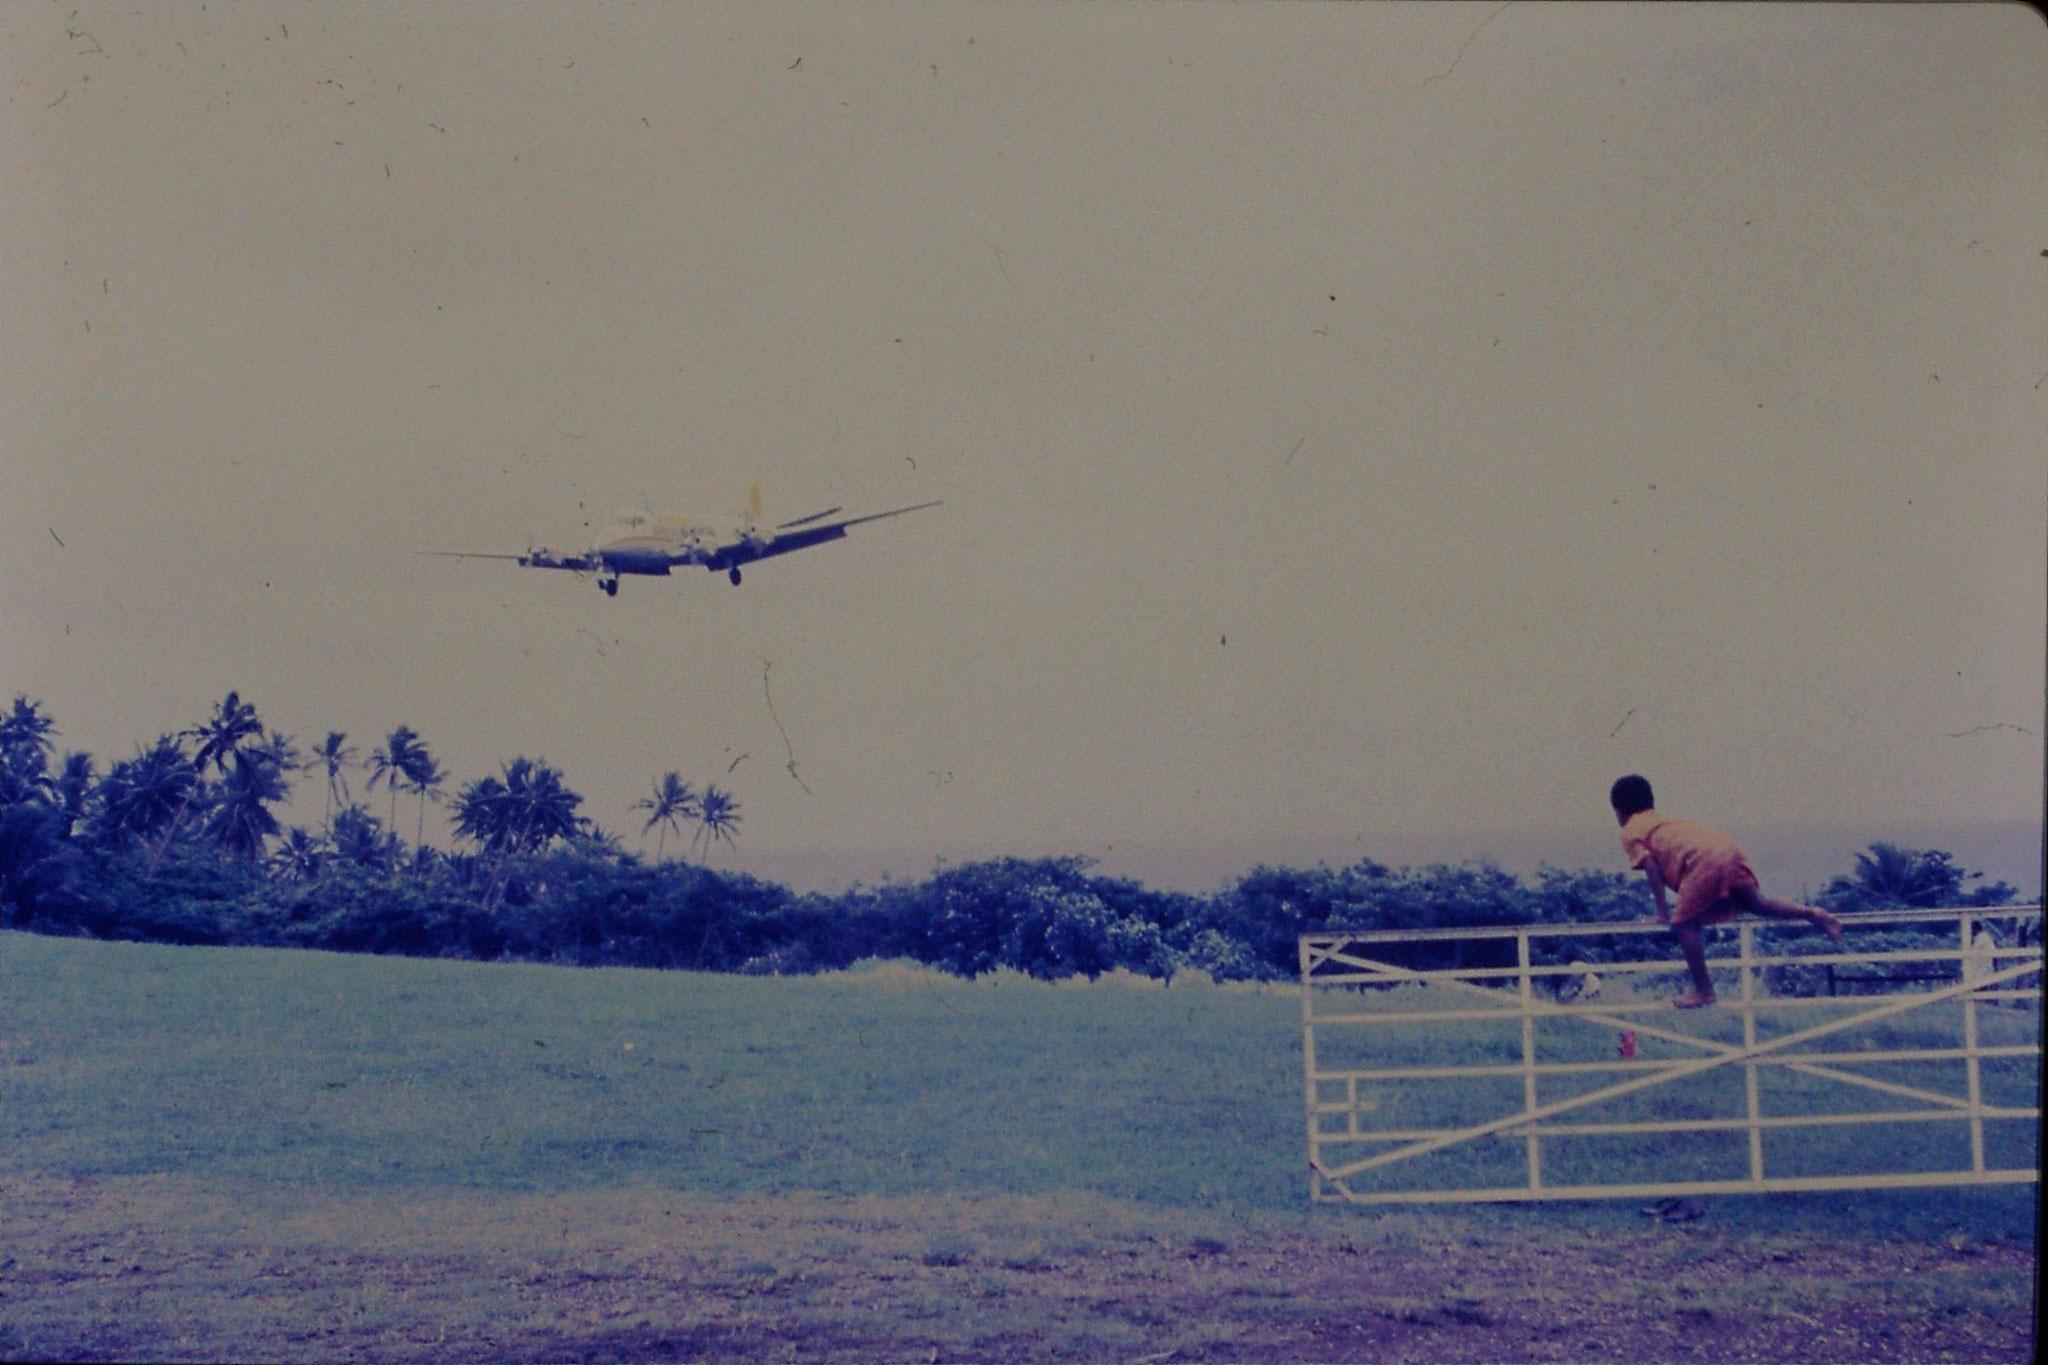 22/11/1990: 25: Somosomo, airport